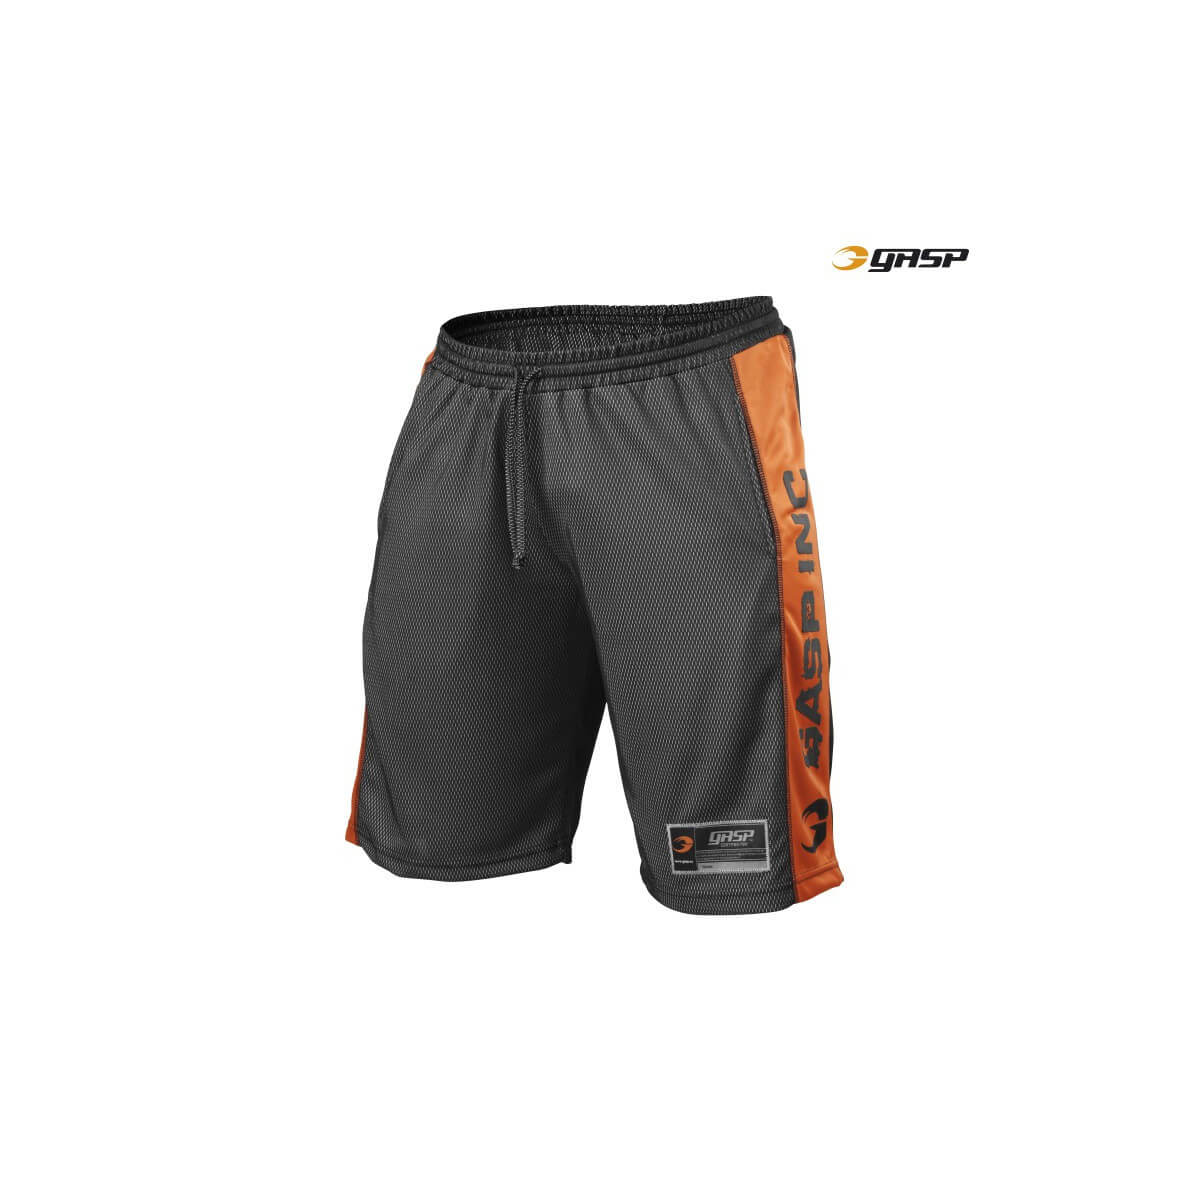 N01 MESH SHORT - Noir-Orange